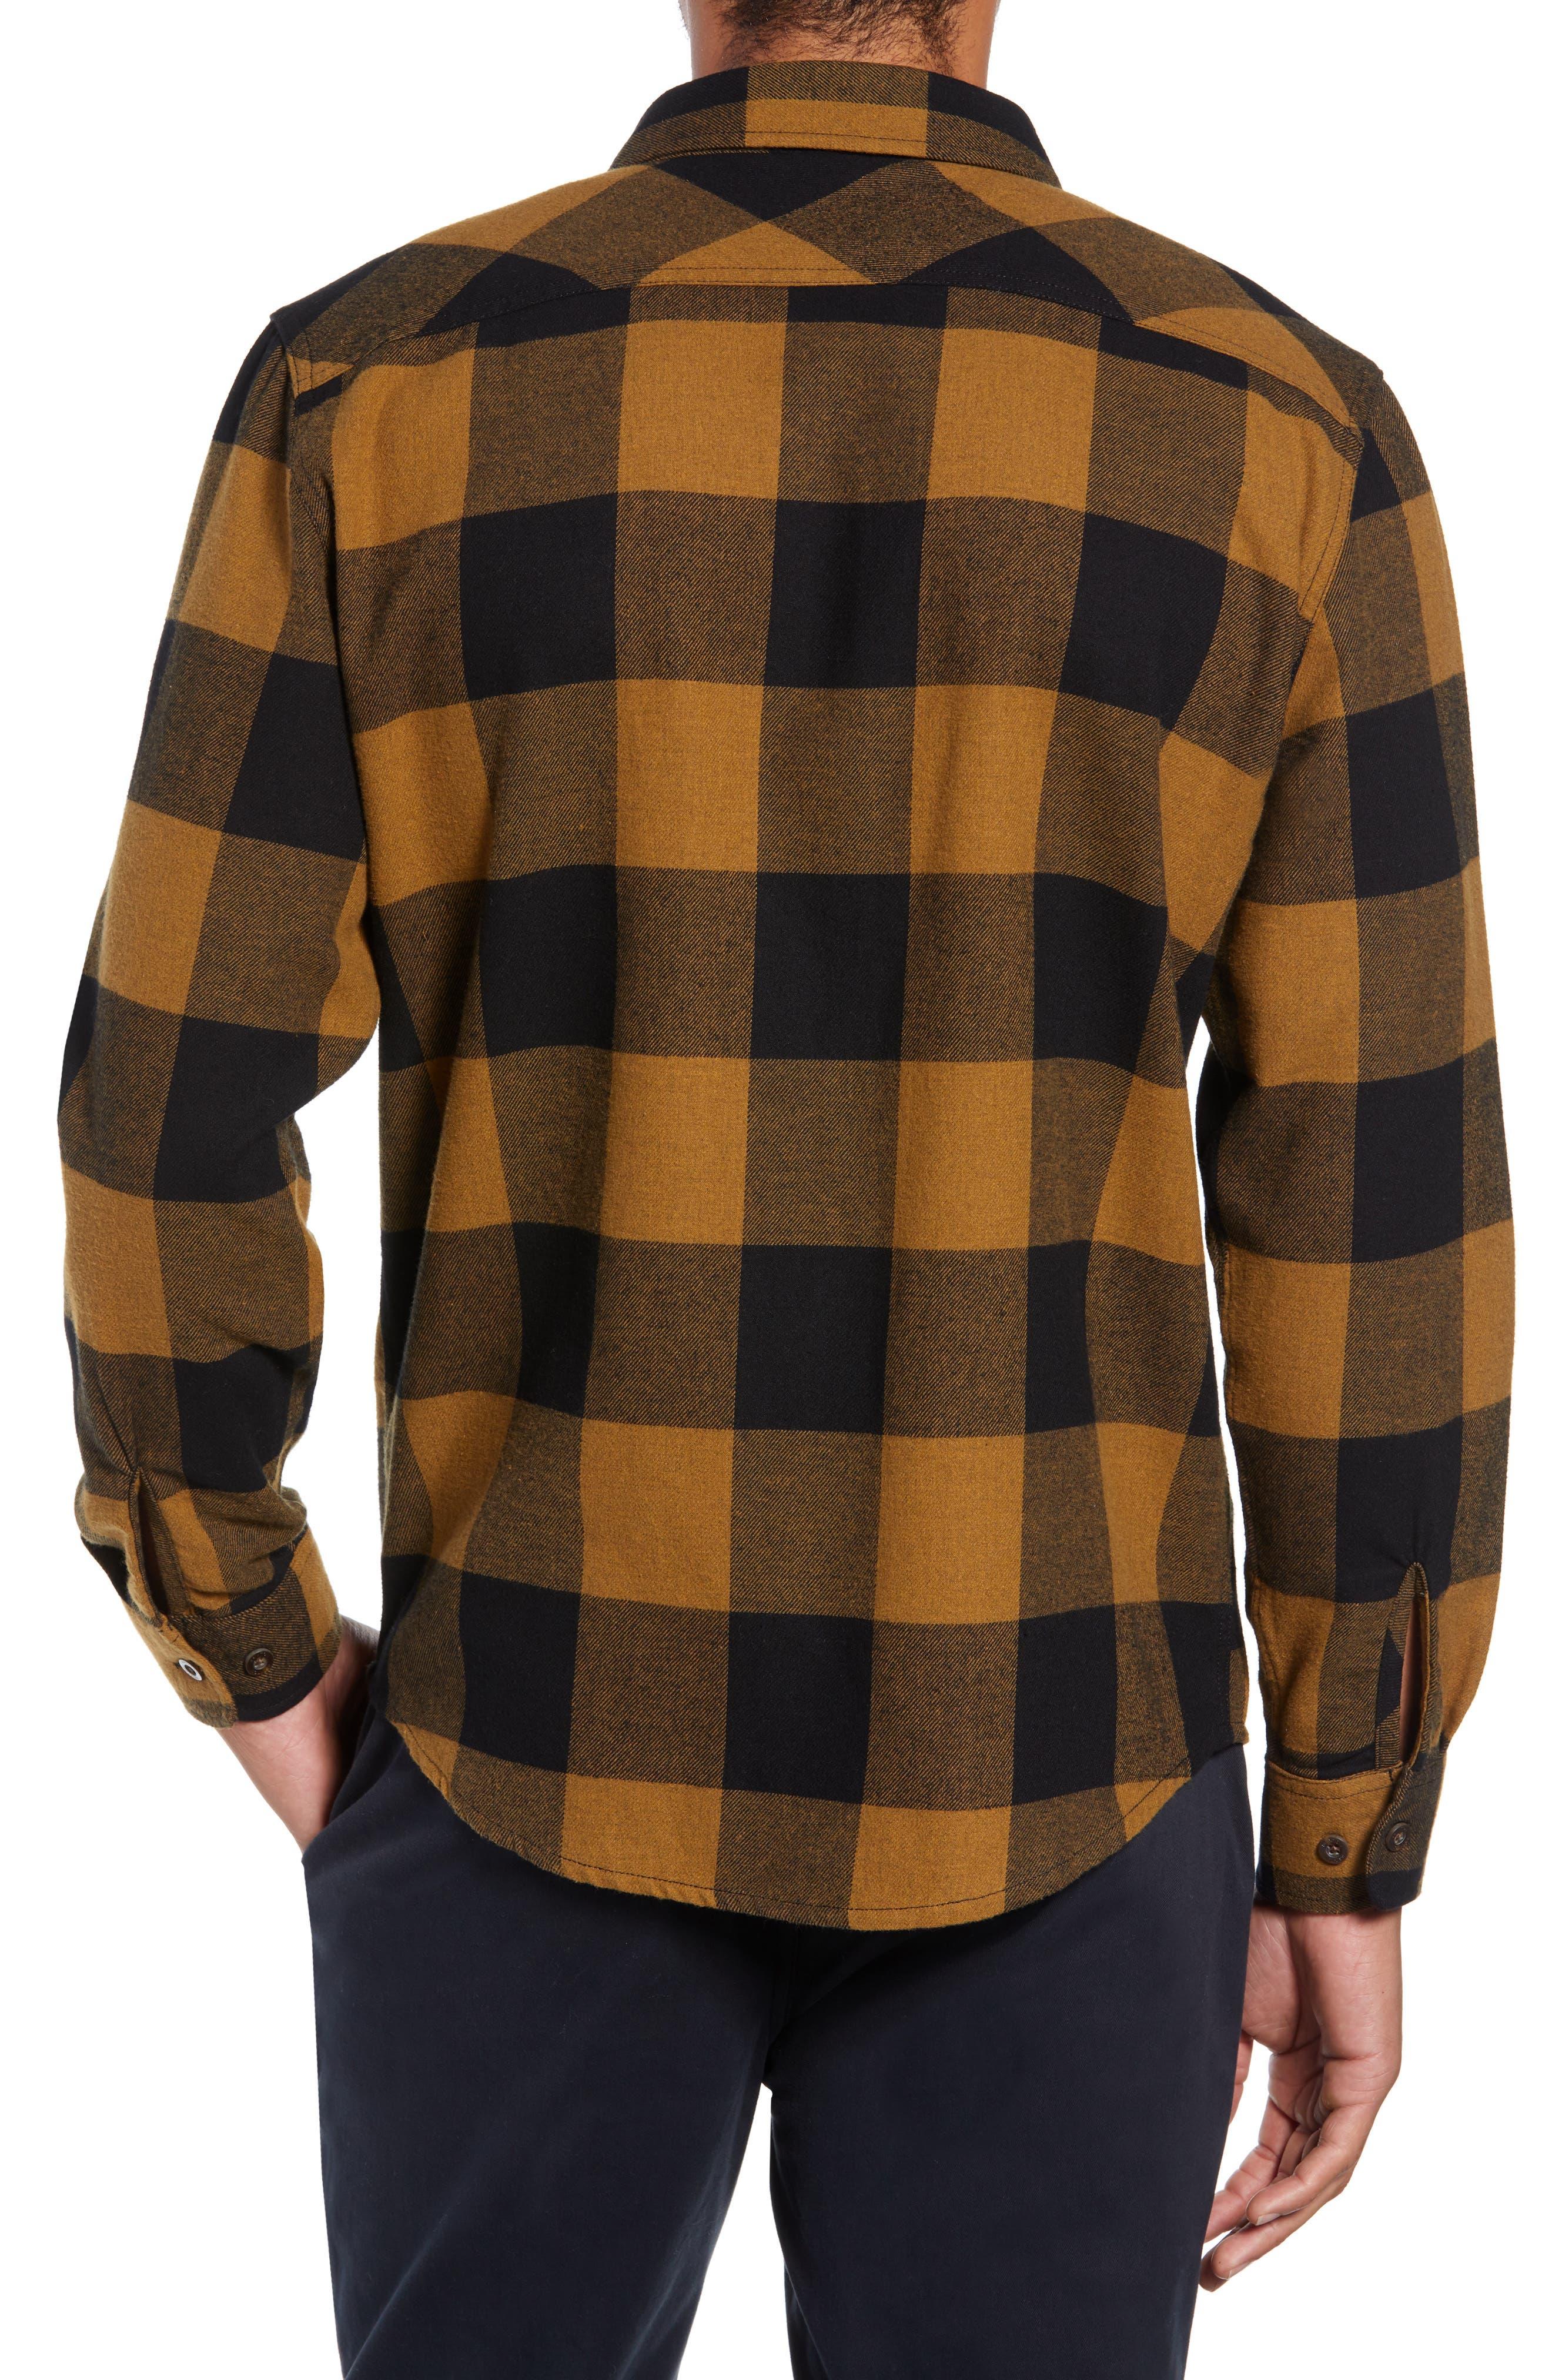 Bowery Buffalo Plaid Flannel Shirt,                             Alternate thumbnail 3, color,                             BLACK/ BRONZE